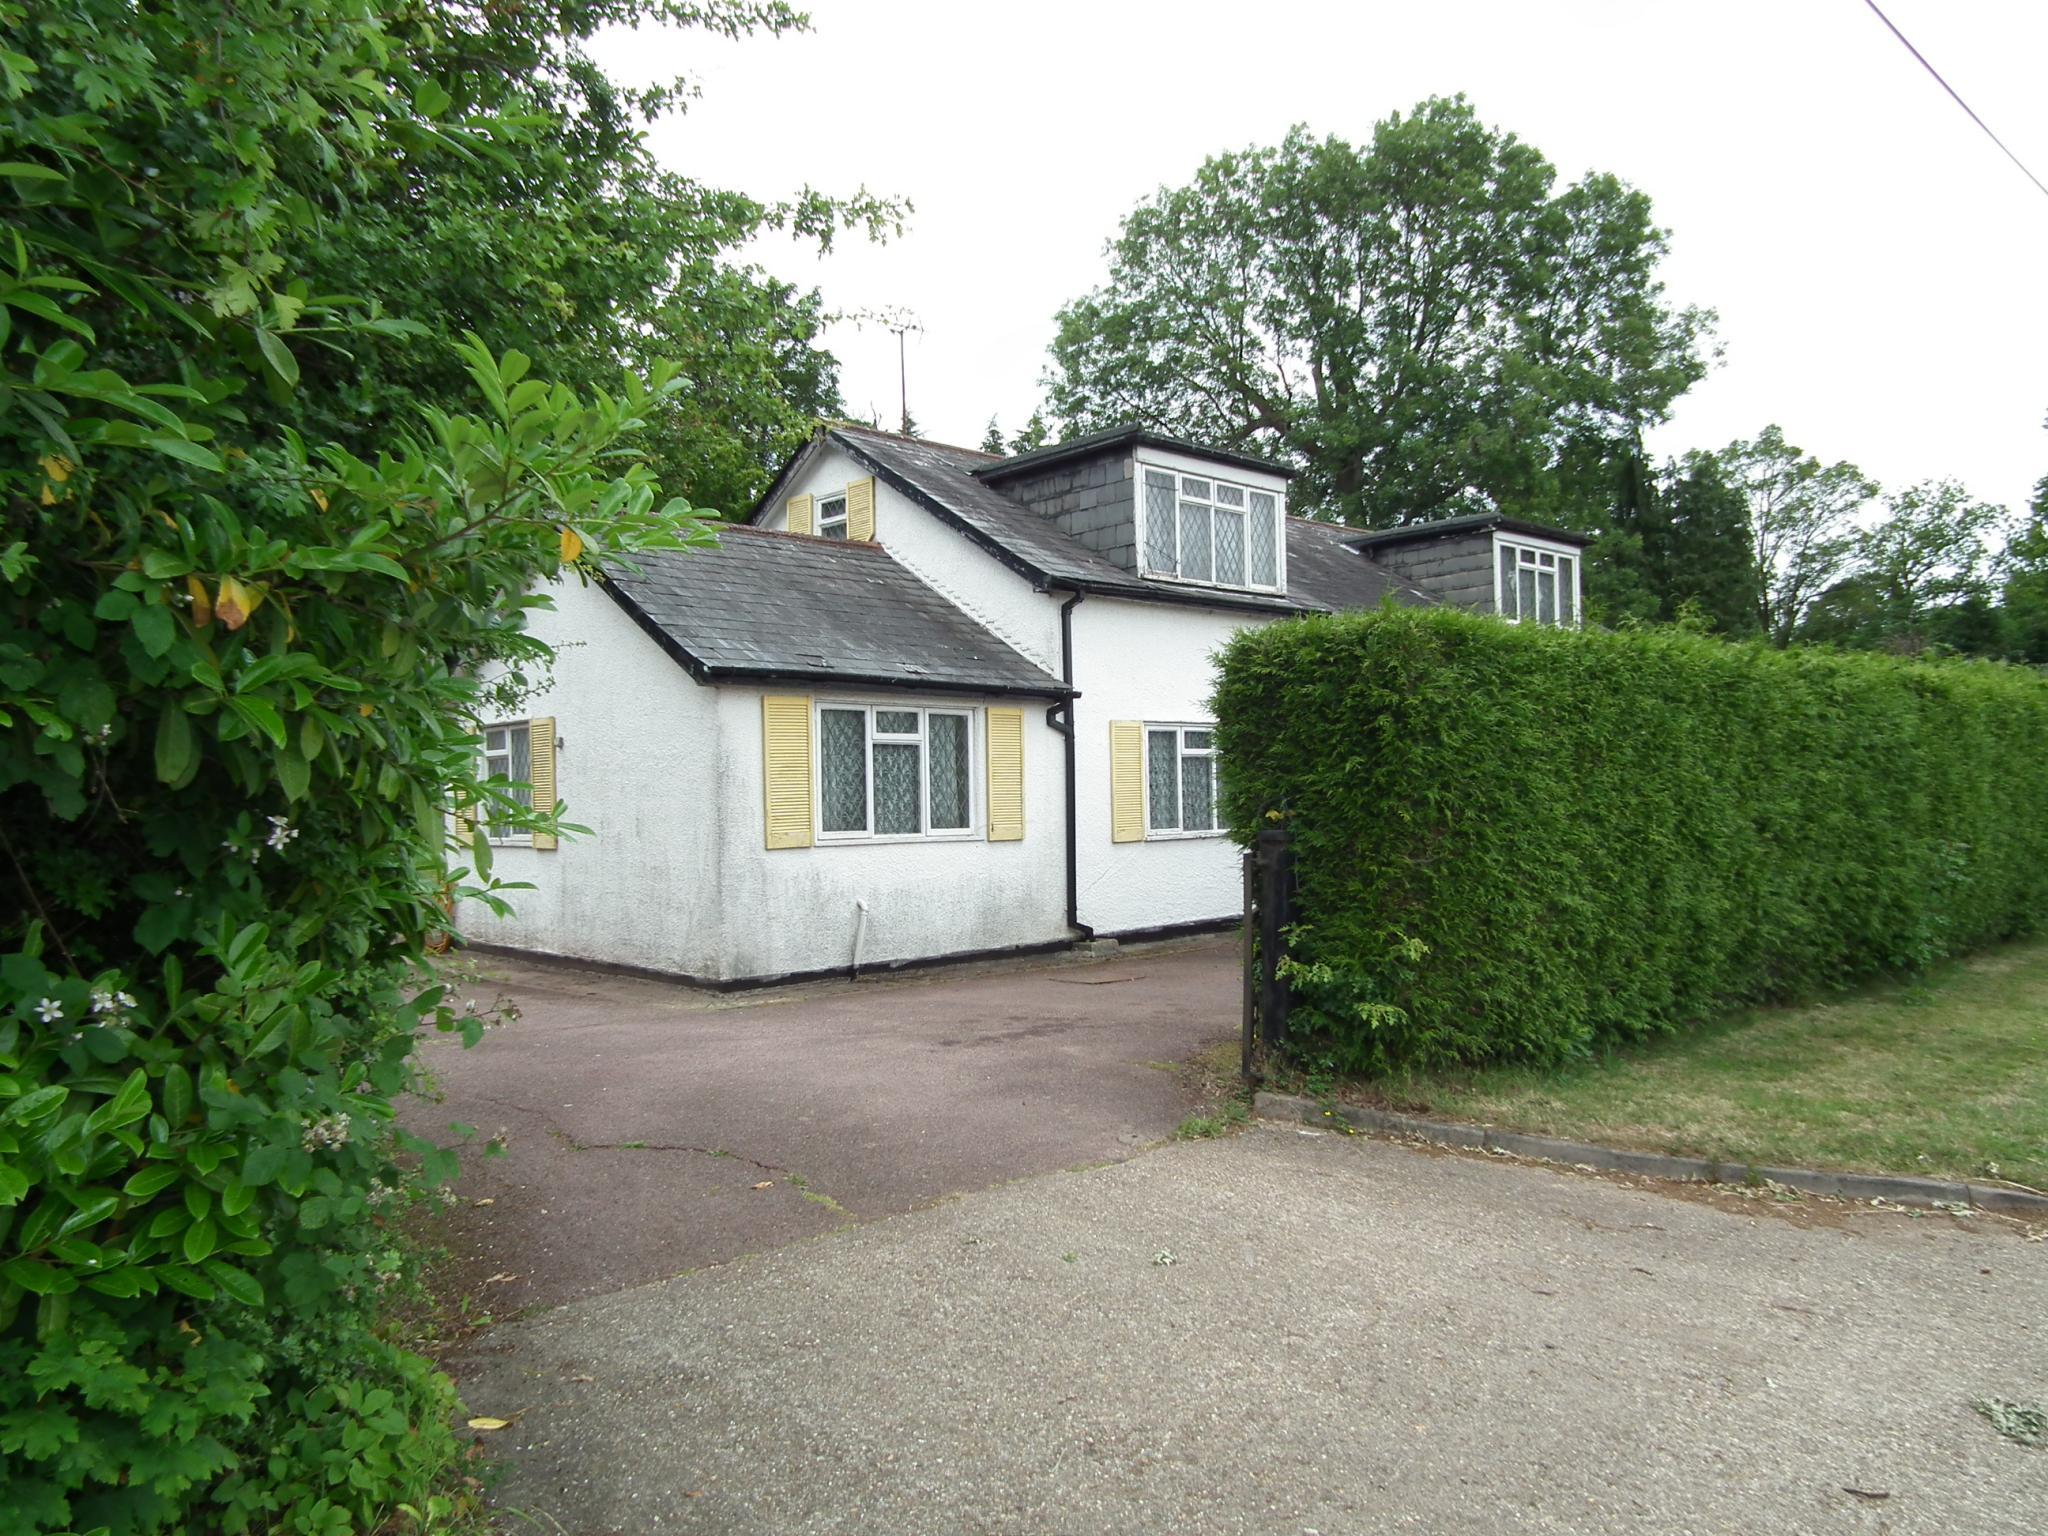 4 bedroom detached bungalow For Sale in Brookmans Park - Property photograph